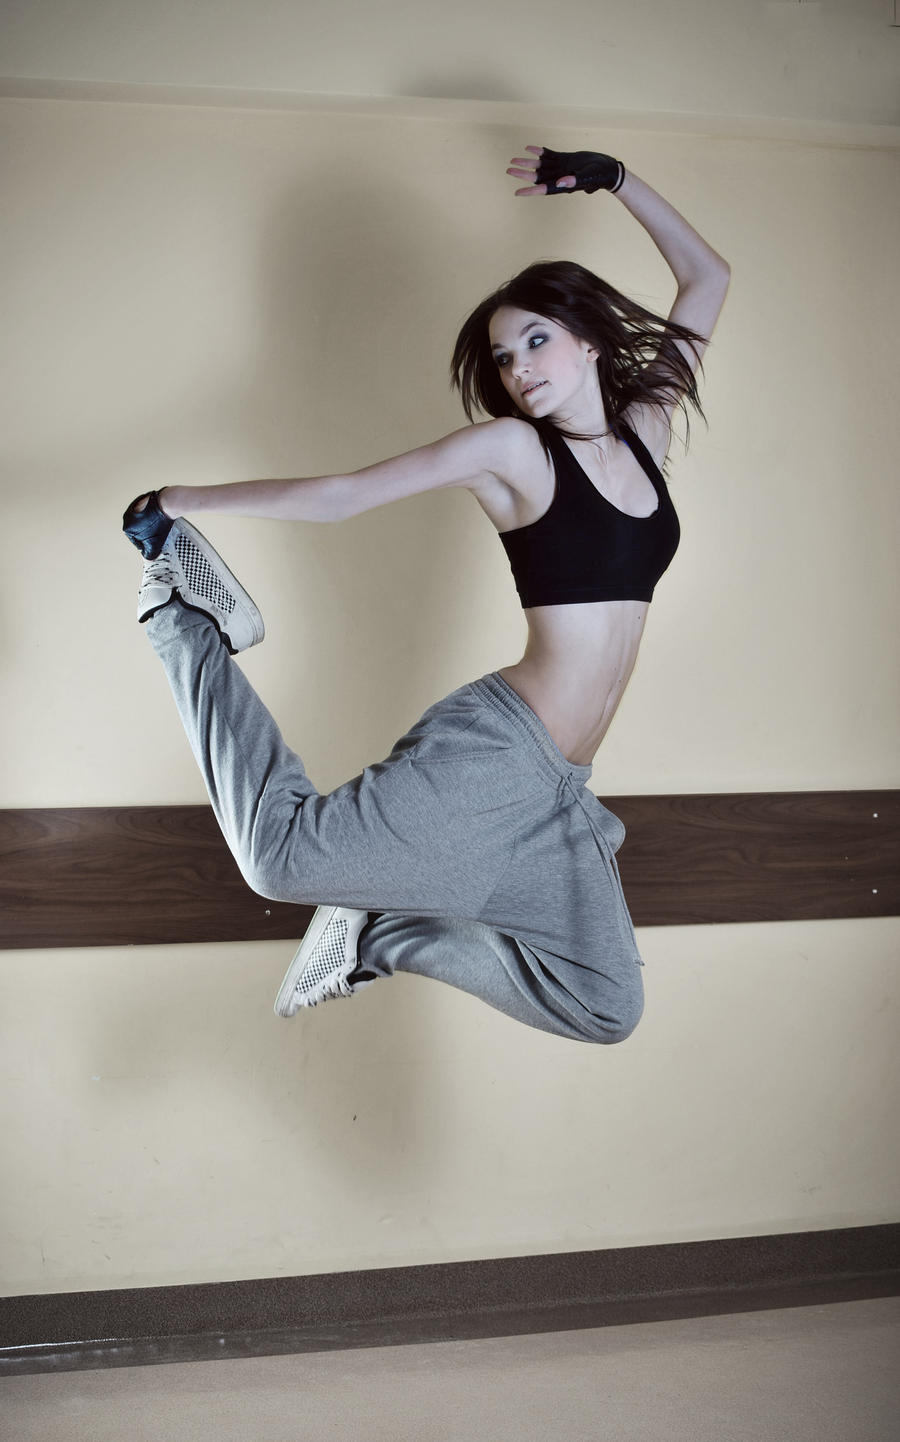 Dance session by sliwka91